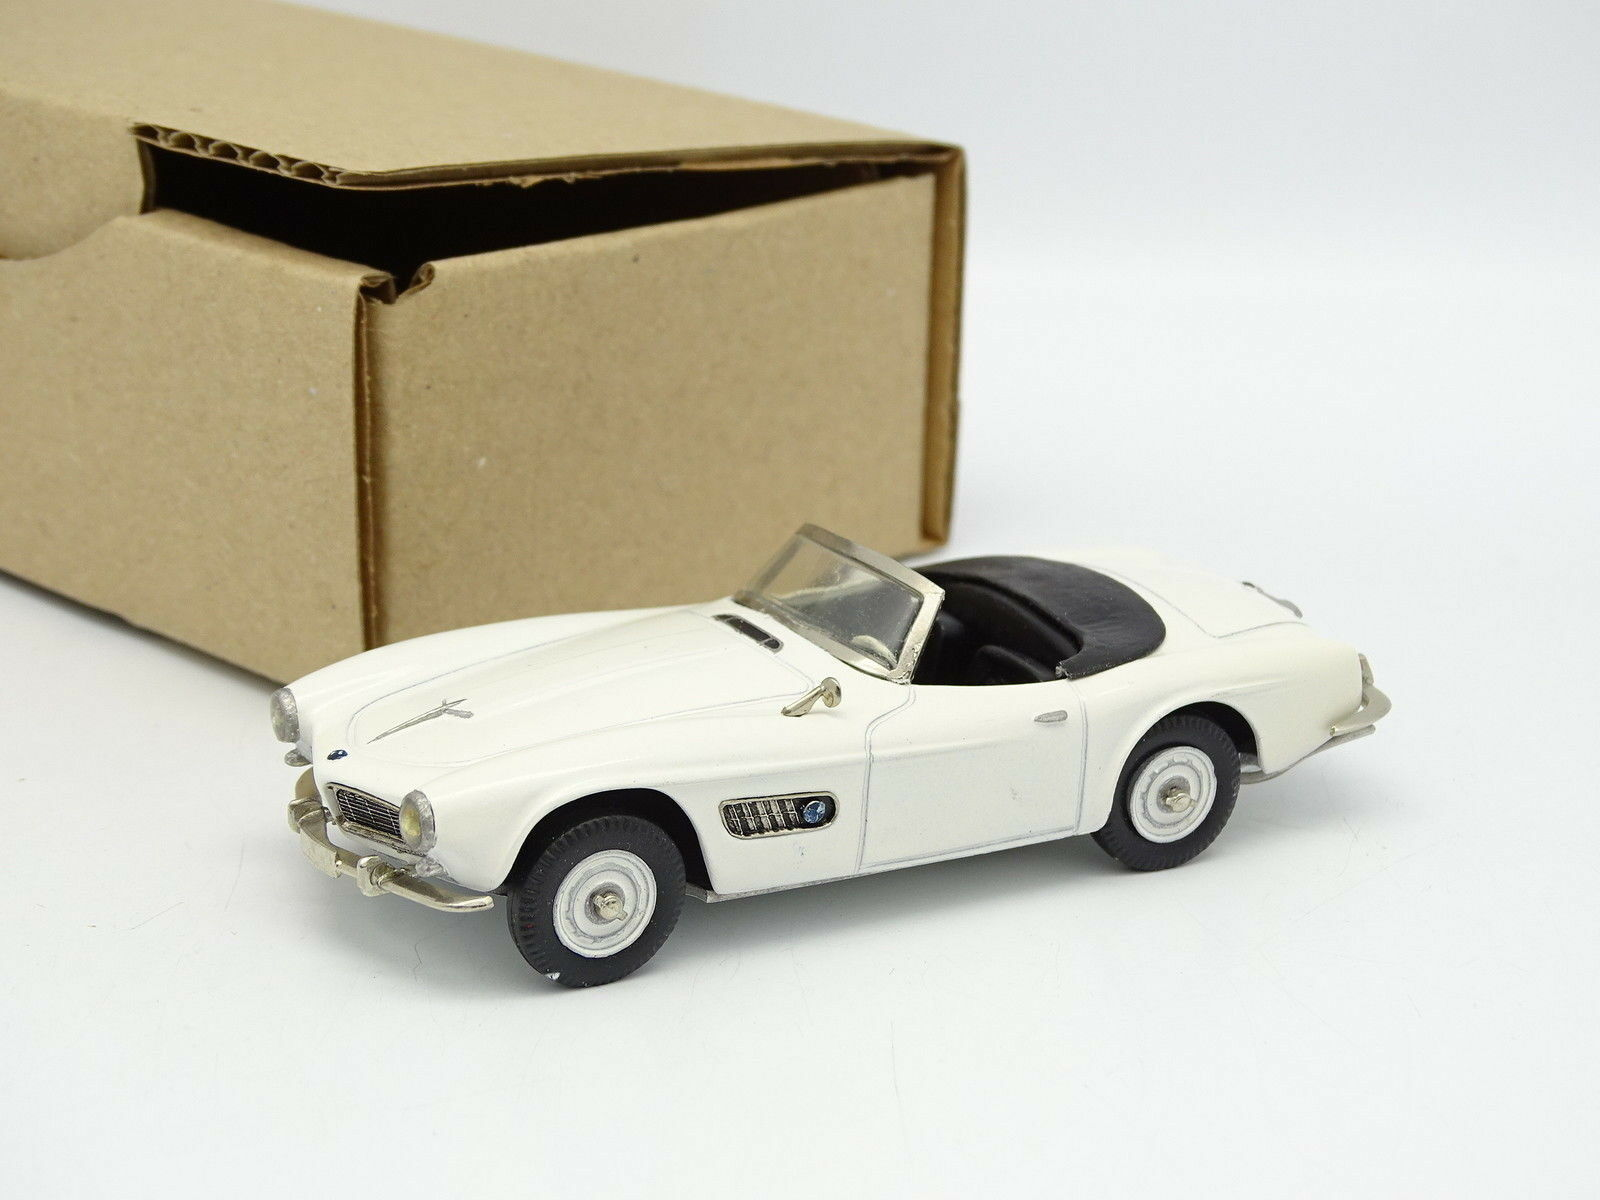 hermoso Oeste Modelos Plumbies Kit Montado Metal Metal Metal 1 43 - BMW 507 Cabriolet blancoo  envio rapido a ti